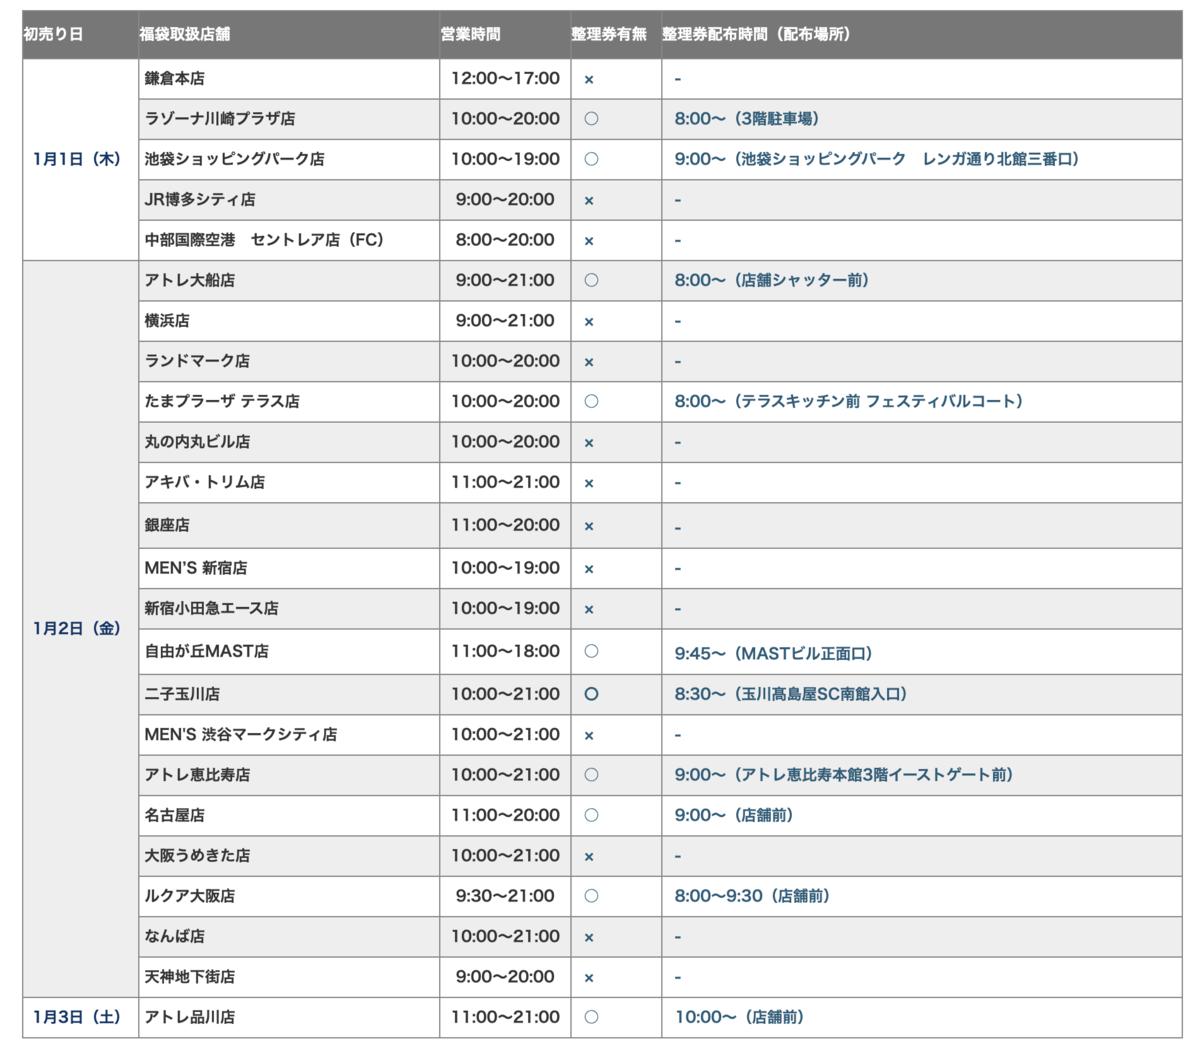 f:id:shingo-sakuragi:20191221074953p:plain